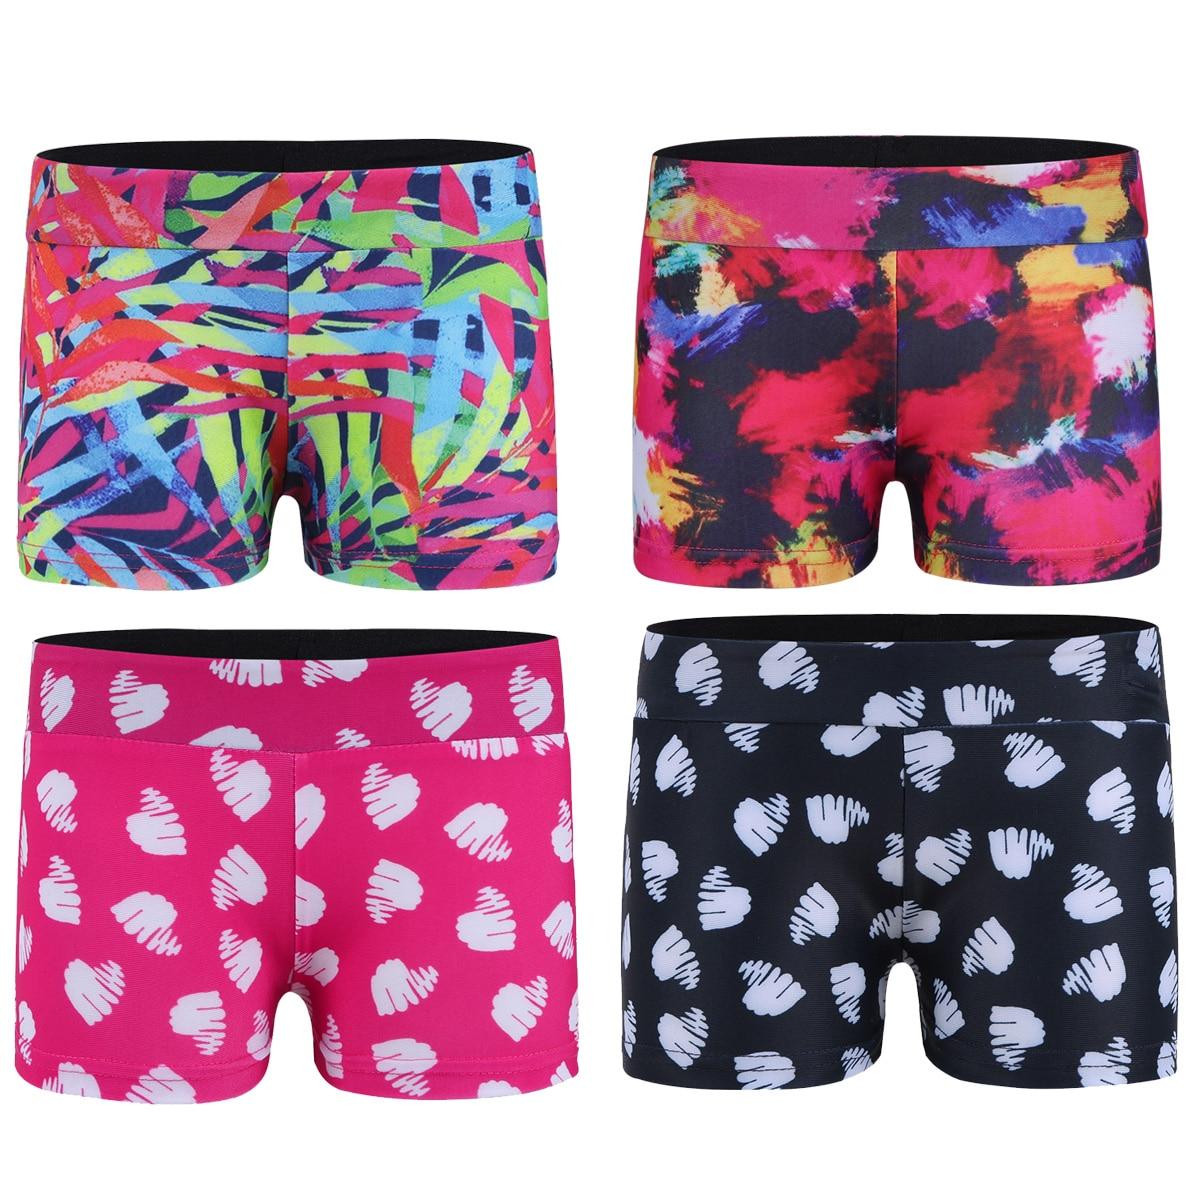 Girls Children Dance   Short   Pants Summer   Shorts   Child Kids Beach   Shorts   Casual Sport   Short   Swimming Gymnastic Workout Wear